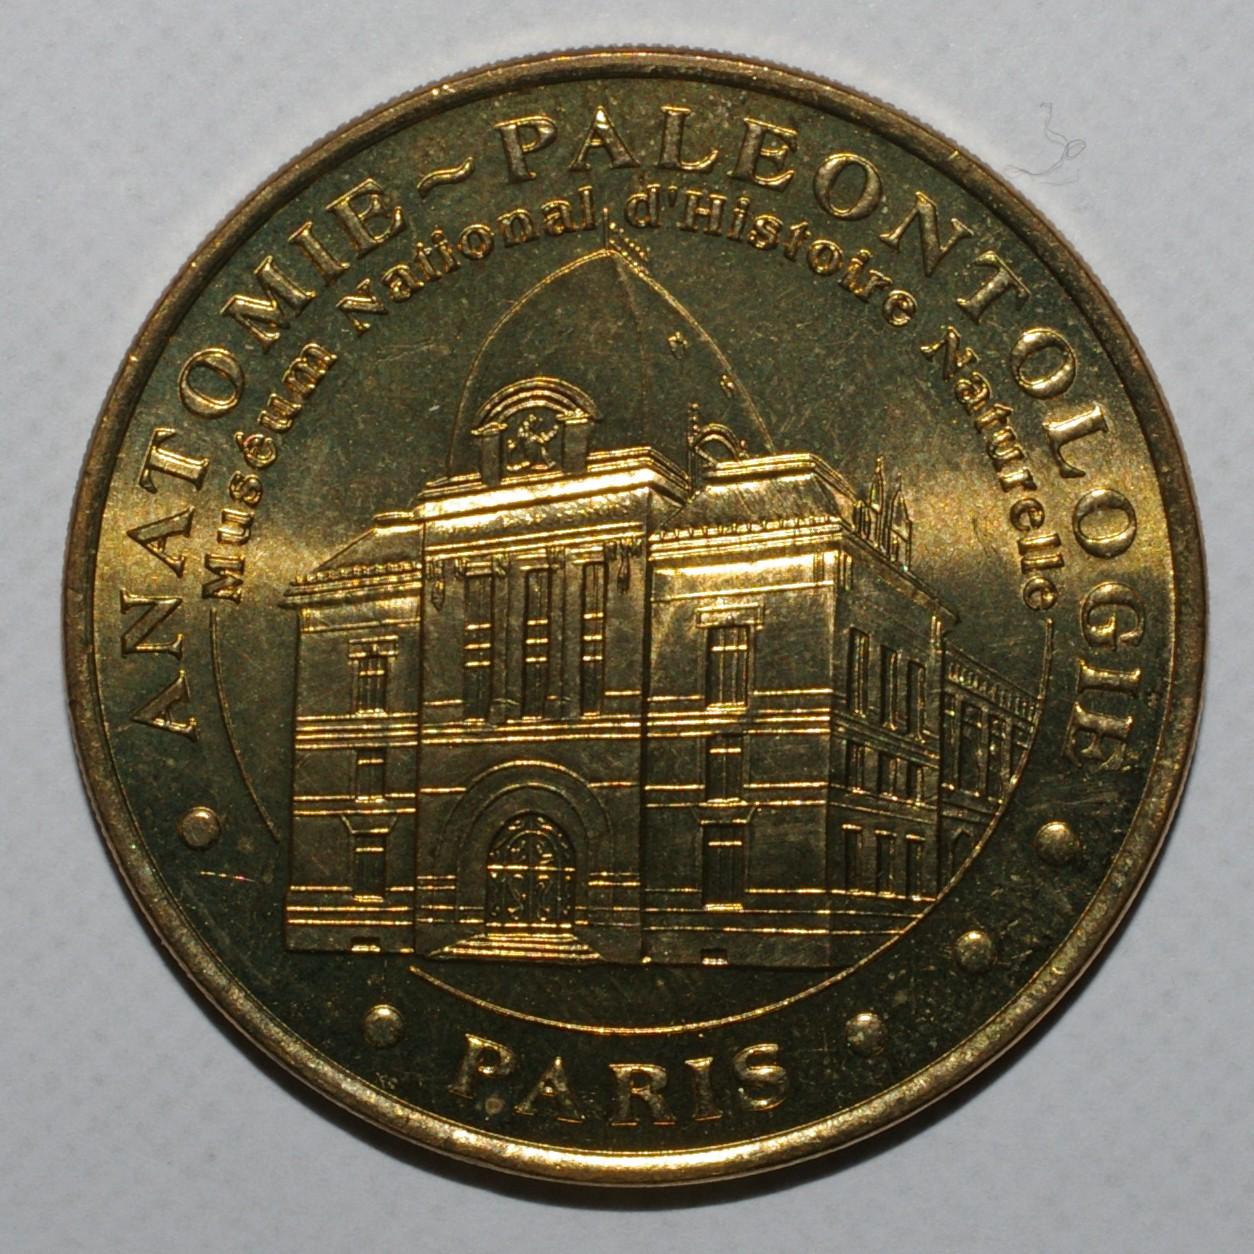 County 75 - PARIS - MUSEUM - ANATOMY - PALEONTOLOGY - MDP - 2002